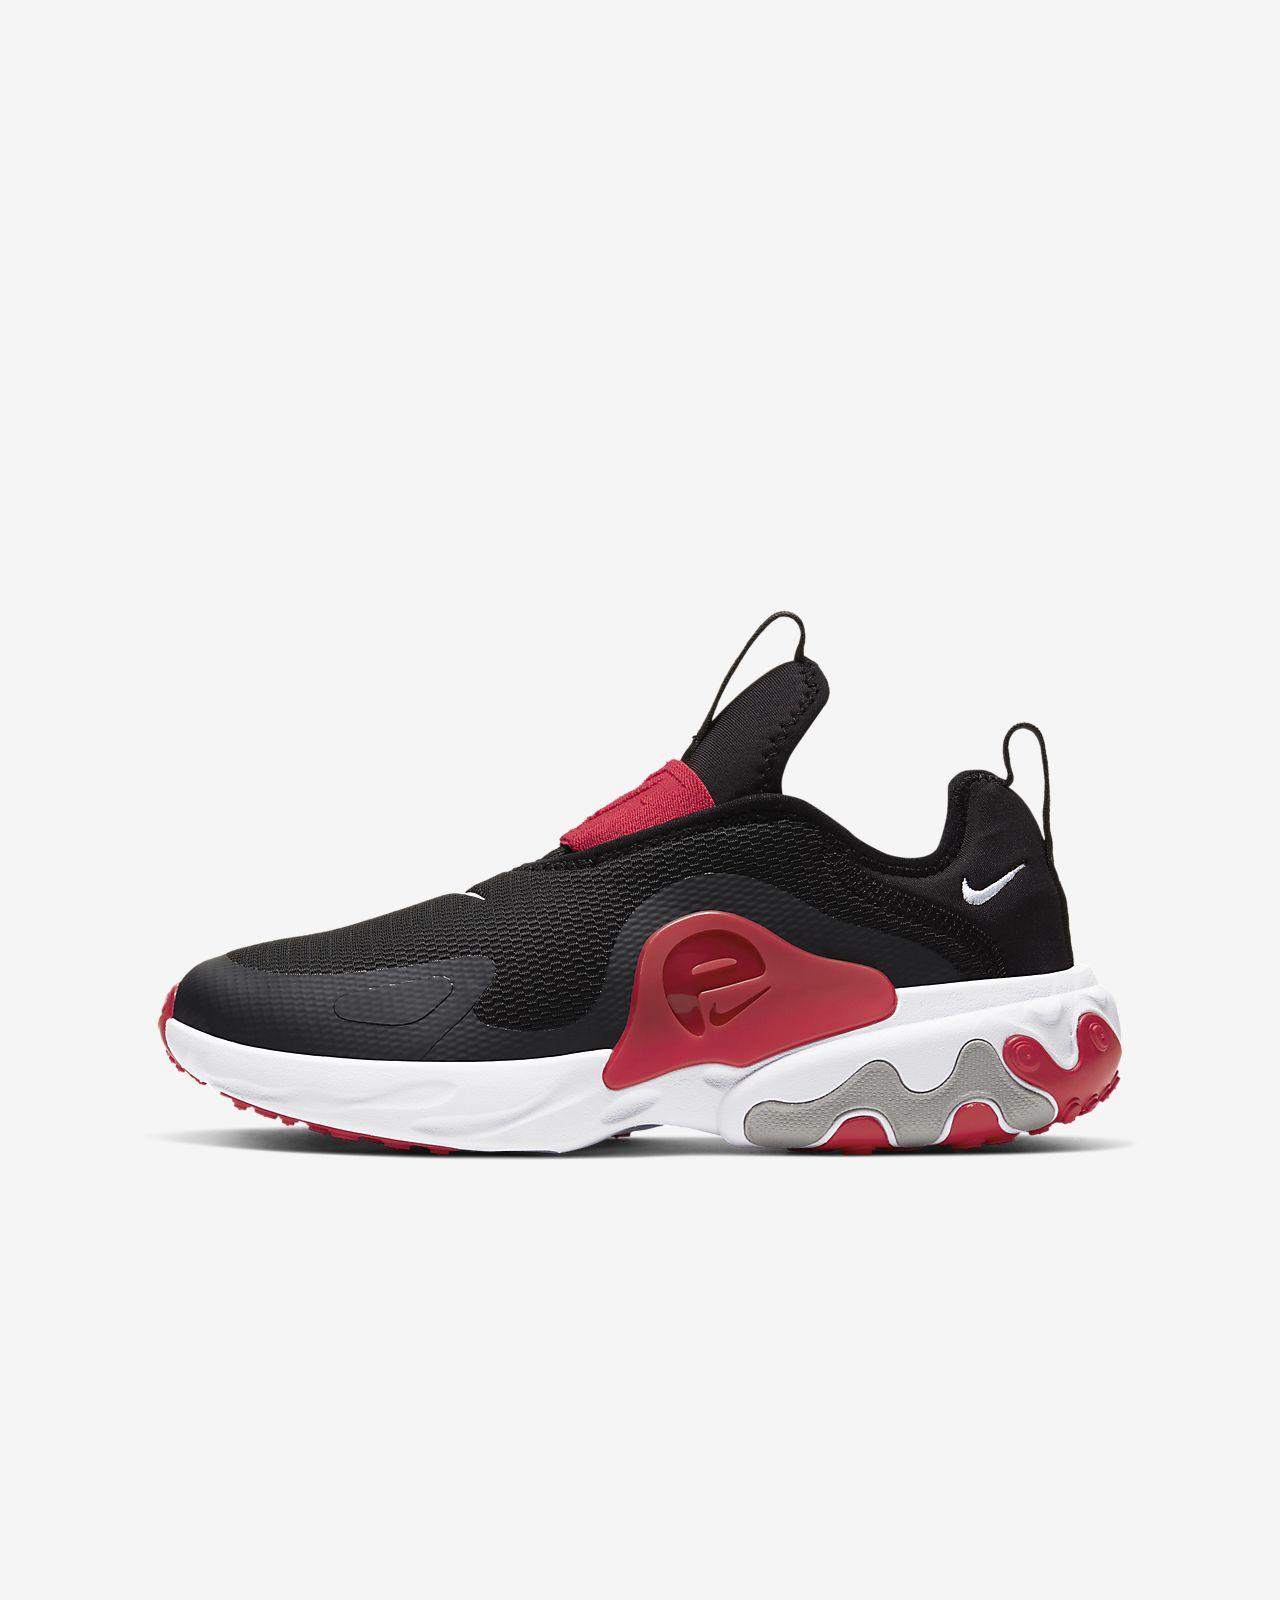 Nike React Presto Extreme Big Kids' Shoe